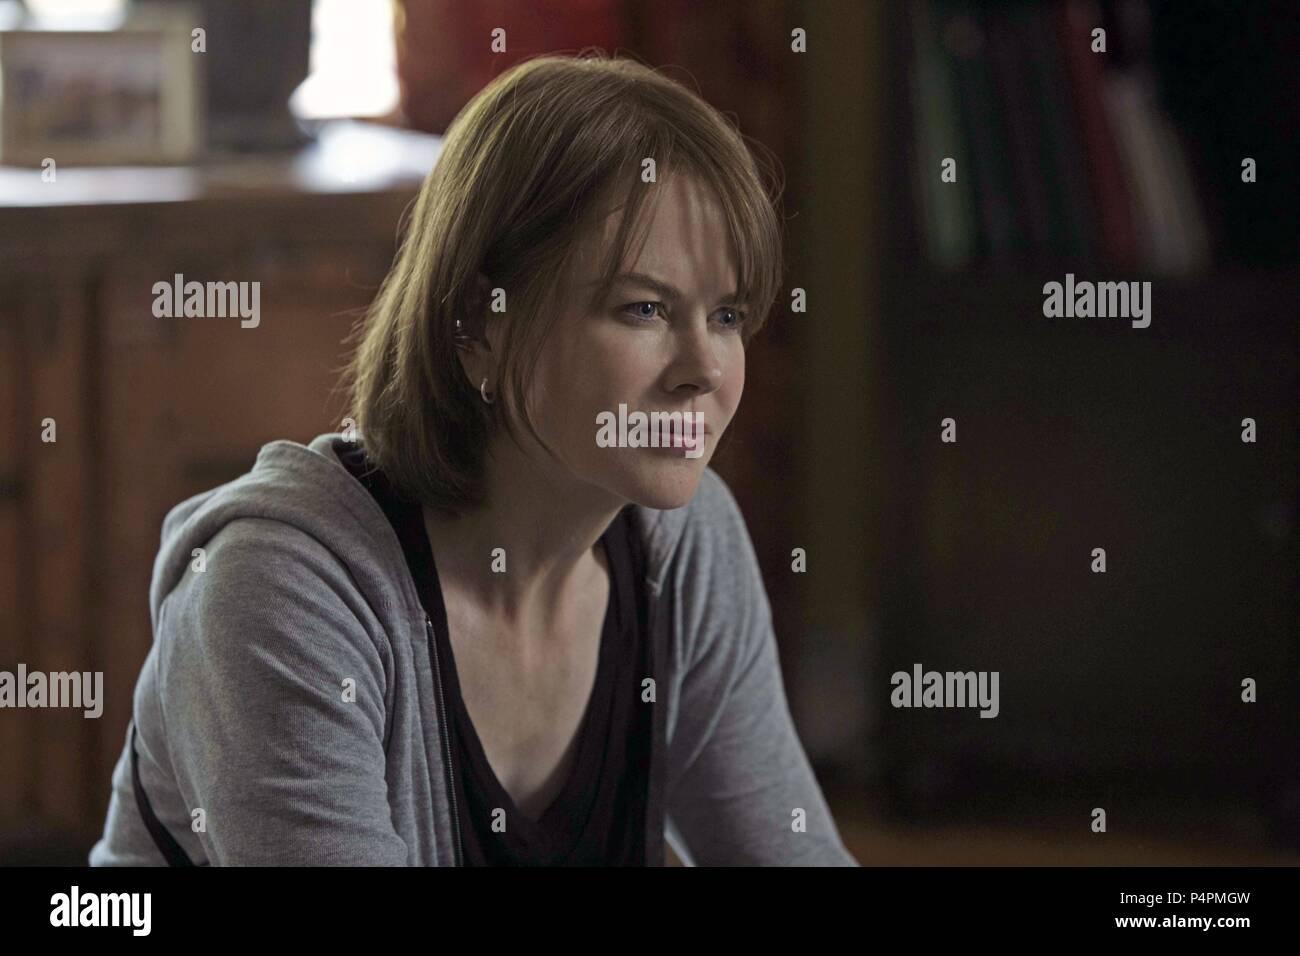 Jason Bateman And Nicole Kidman Stock Photos & Jason Bateman And ...